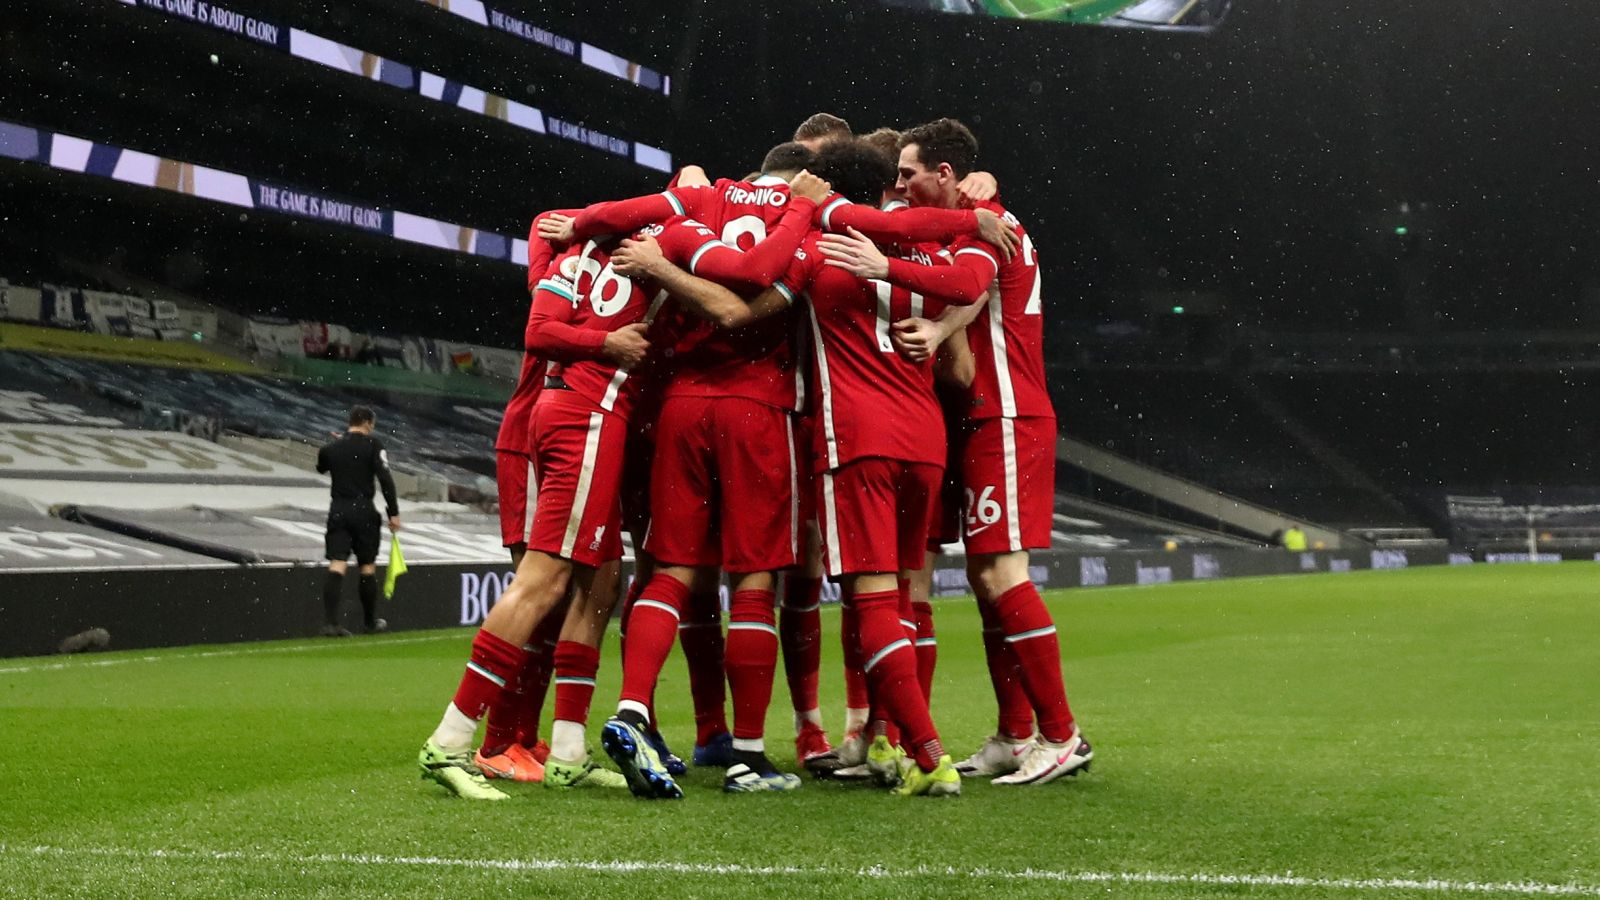 Skuad Liverpool berselebrasi usai mengalahkan Tottenham. (foto: twitter.com/LFC)